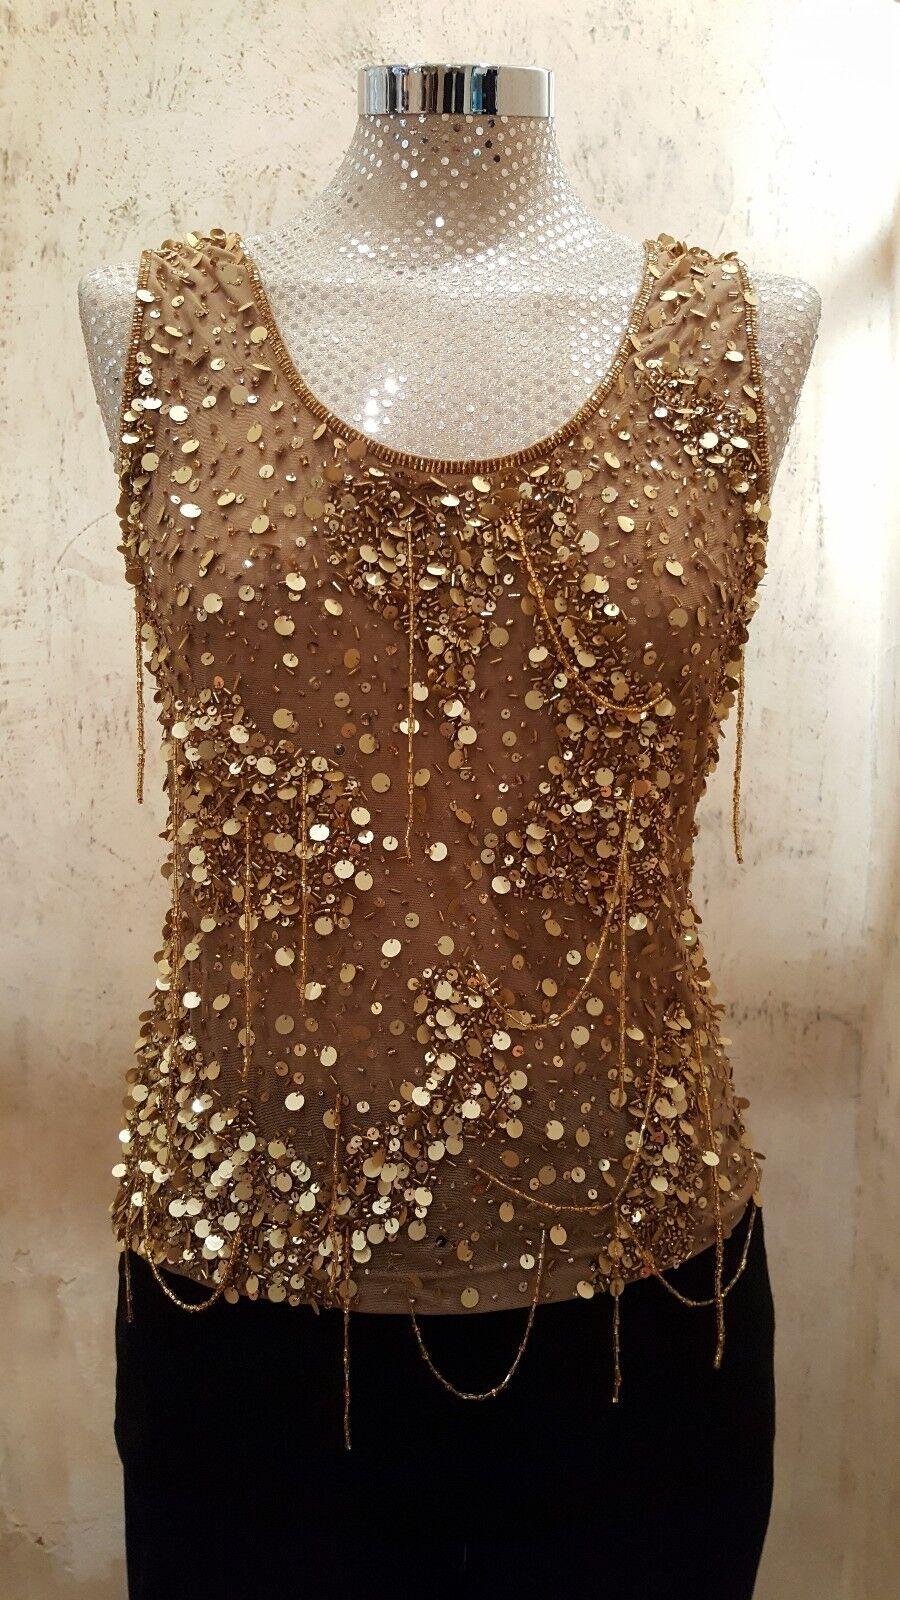 gold sequin and bead medium designer sleeveless top by Mondi was